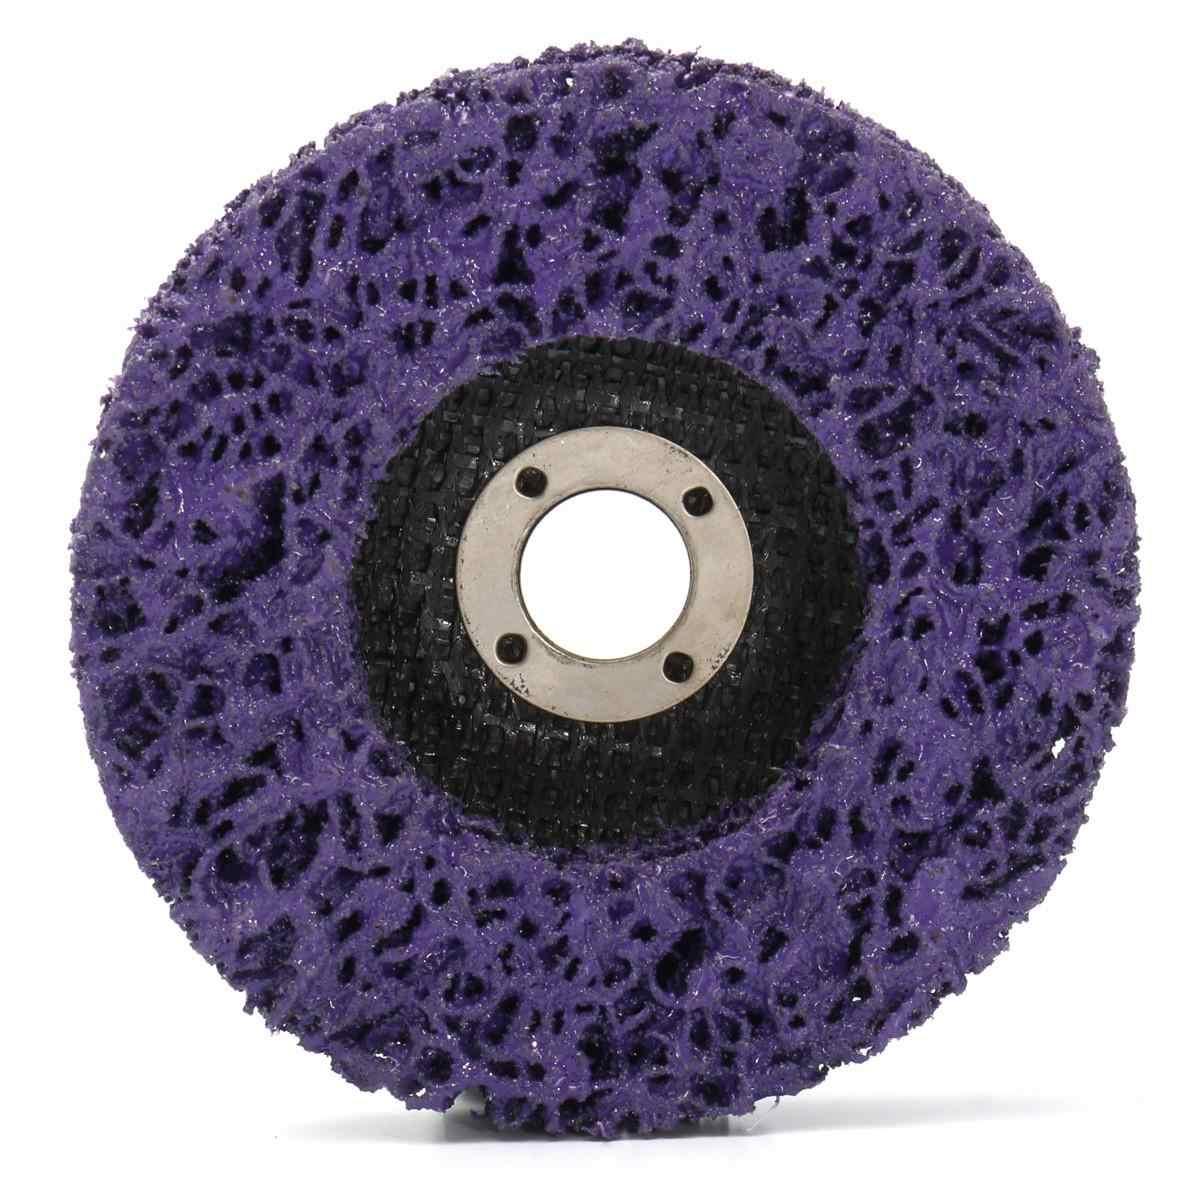 5pcs-Set-100x16mm-Poly-Strip-Stripper-Disc-Wheel-Stripper-Clean-Grinder-Remover-Removal-Paint-Rust-Sanding.jpg_q50.jpg